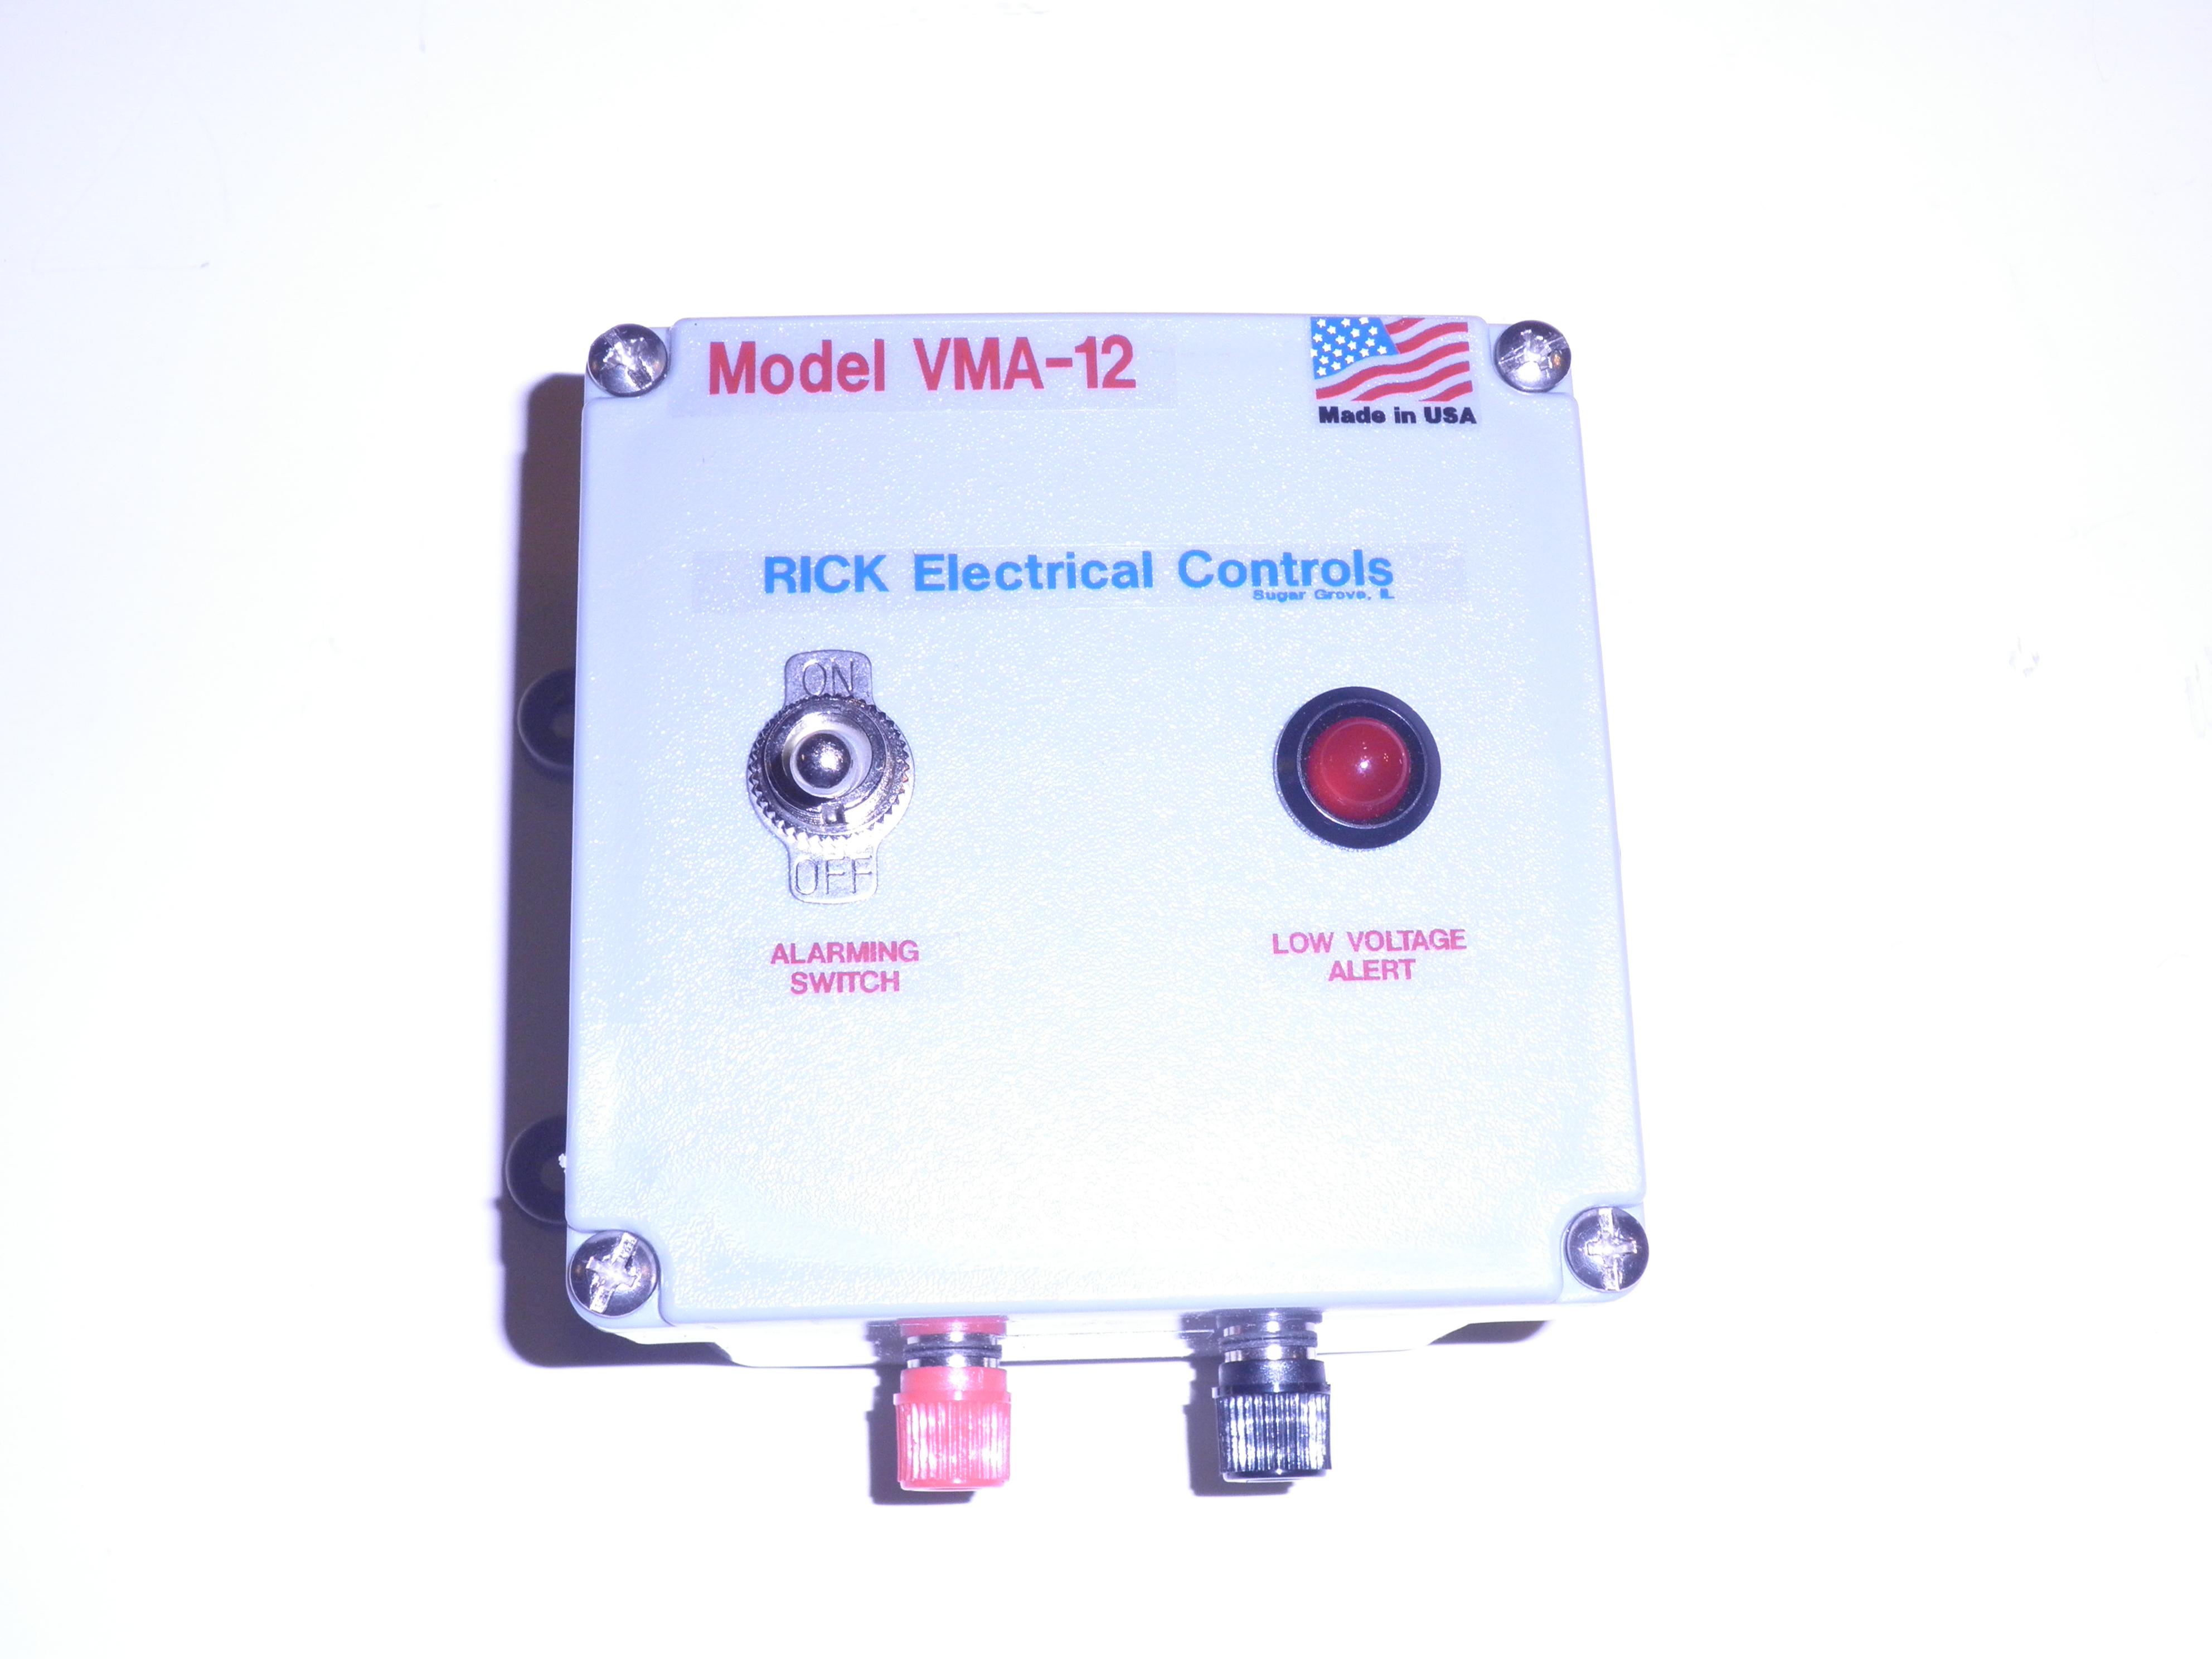 f859c0e9-f5e3-4c56-b846-3471fed069cd_VMA-12.jpg